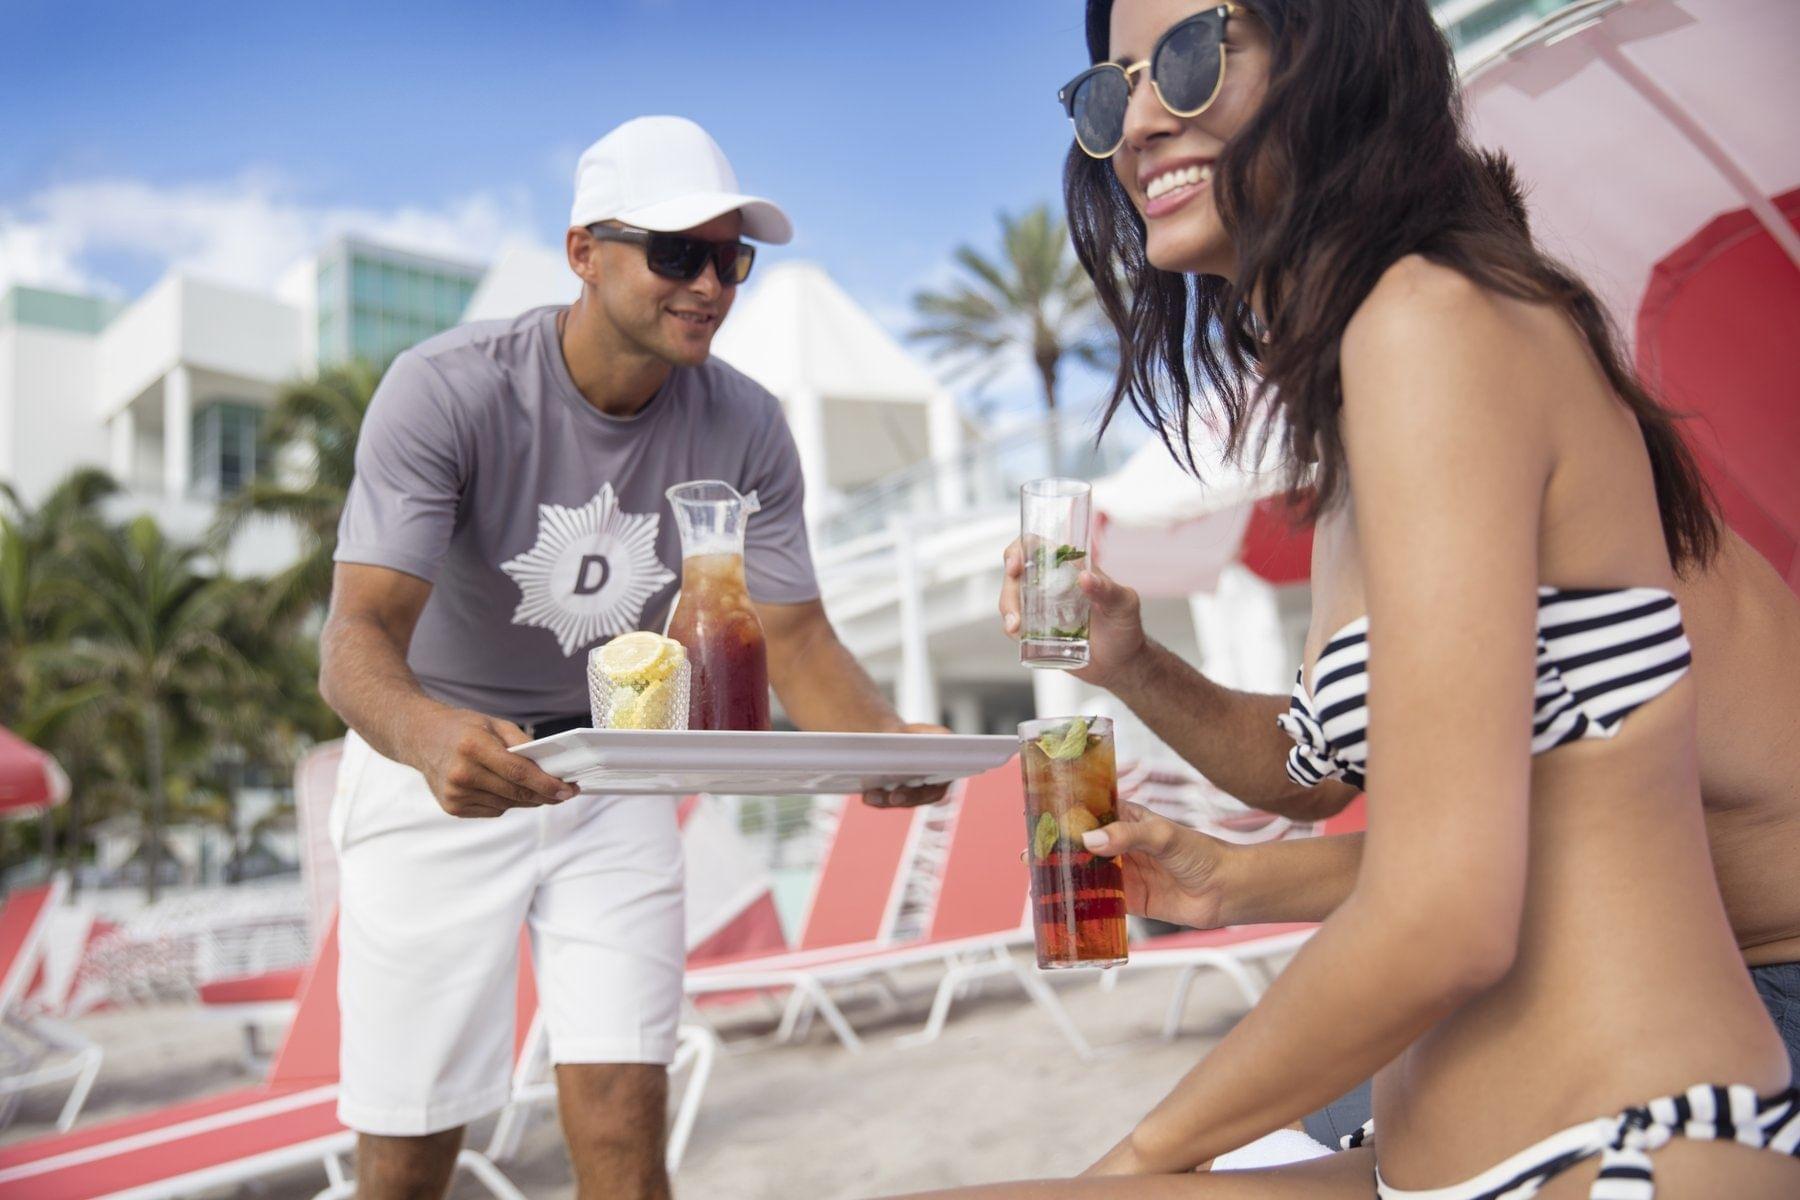 Drink Service at Beach - The Diplomat Resort